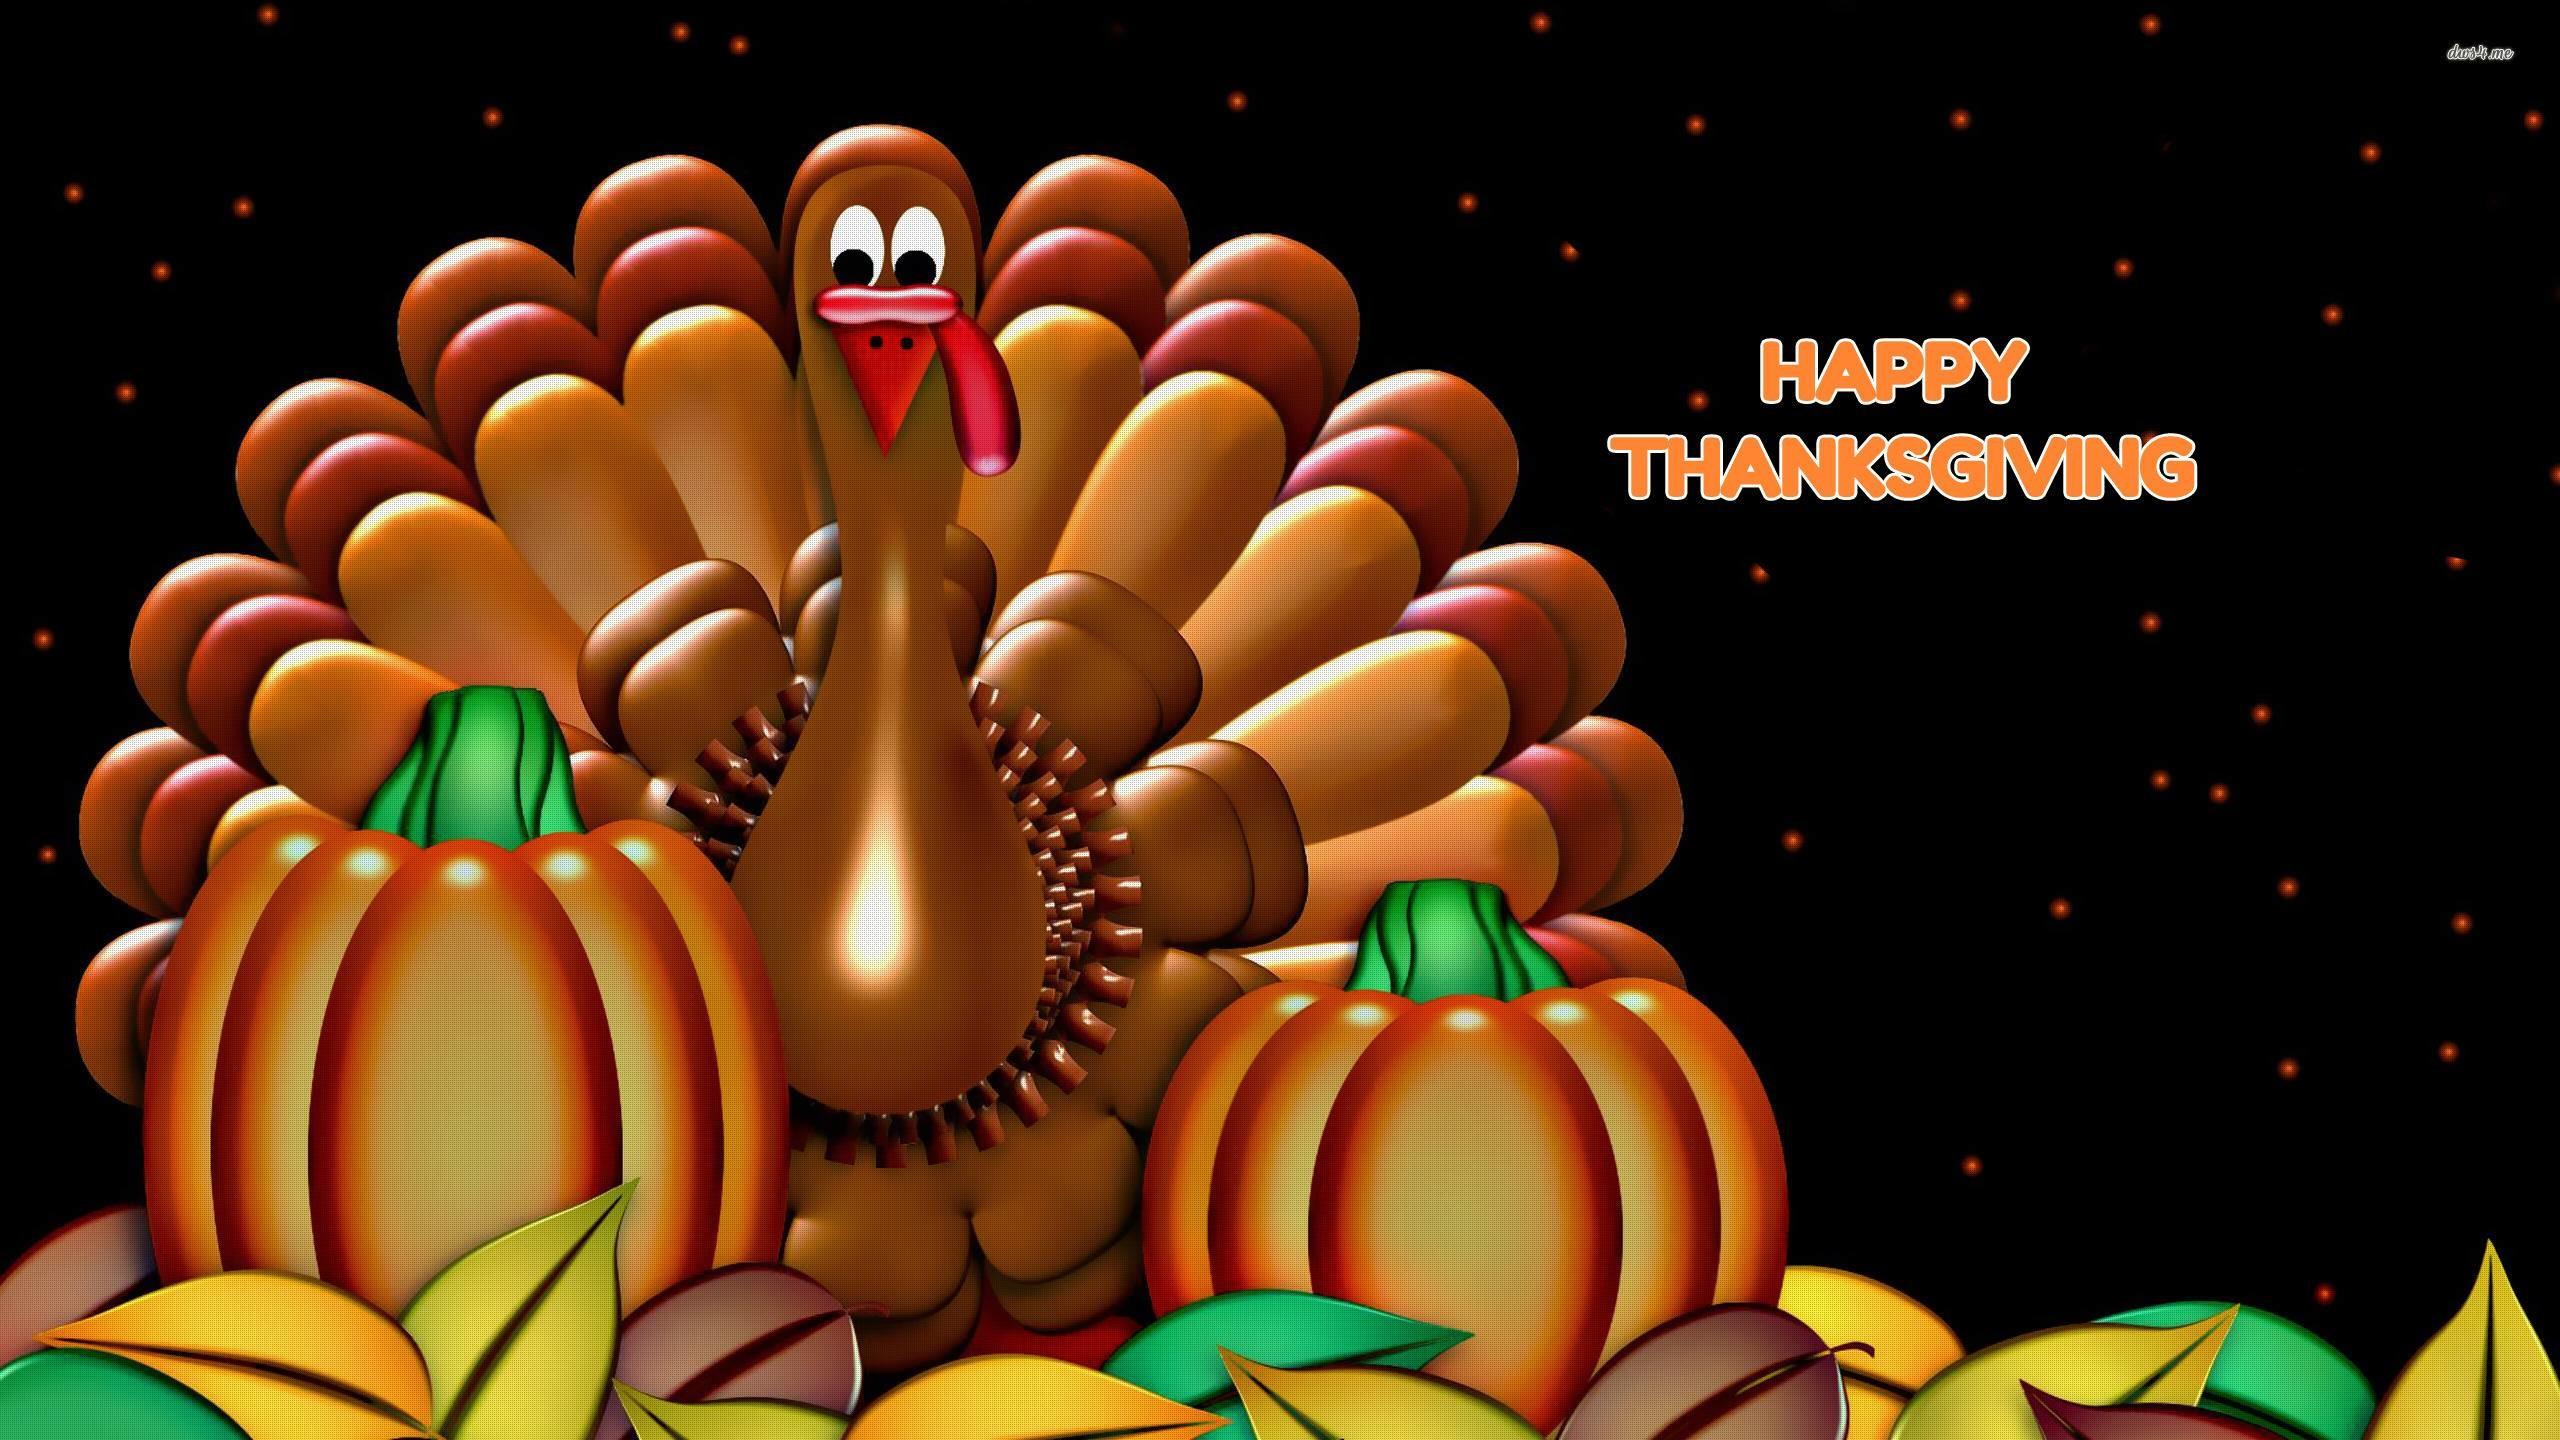 Free Thanksgiving Wallpaper Desktop Background Â« Long - Apple Thanksgiving Wallpapers Hd - HD Wallpaper